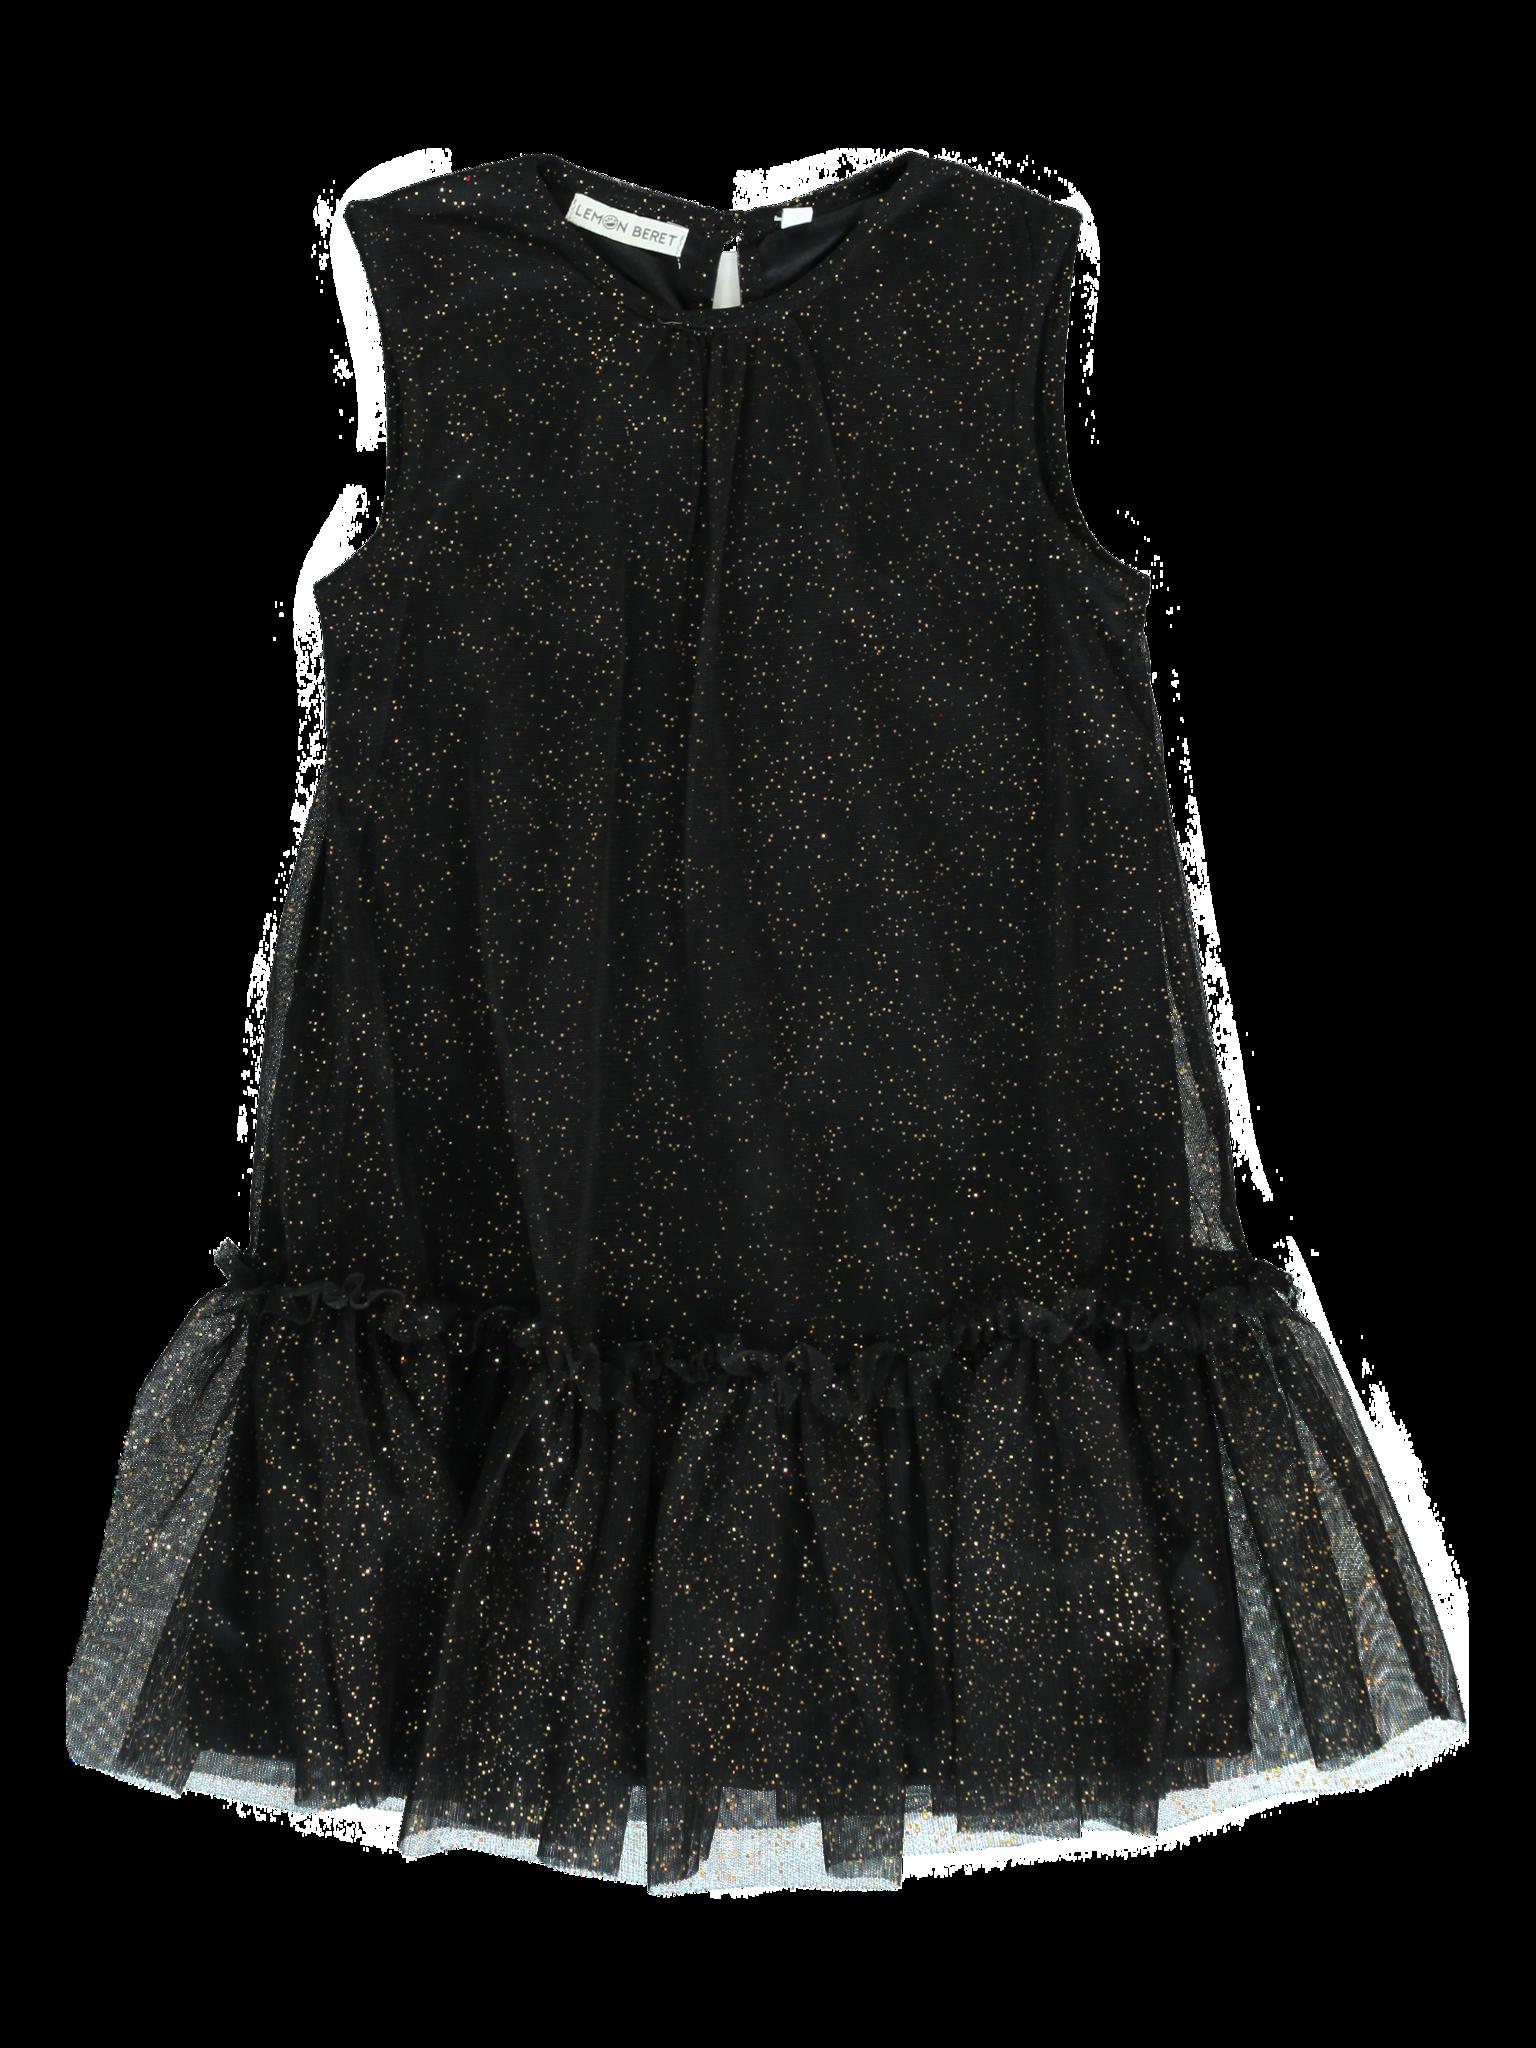 All Brands | Winterproducts Small Girls | Dress | 10 pcs/box